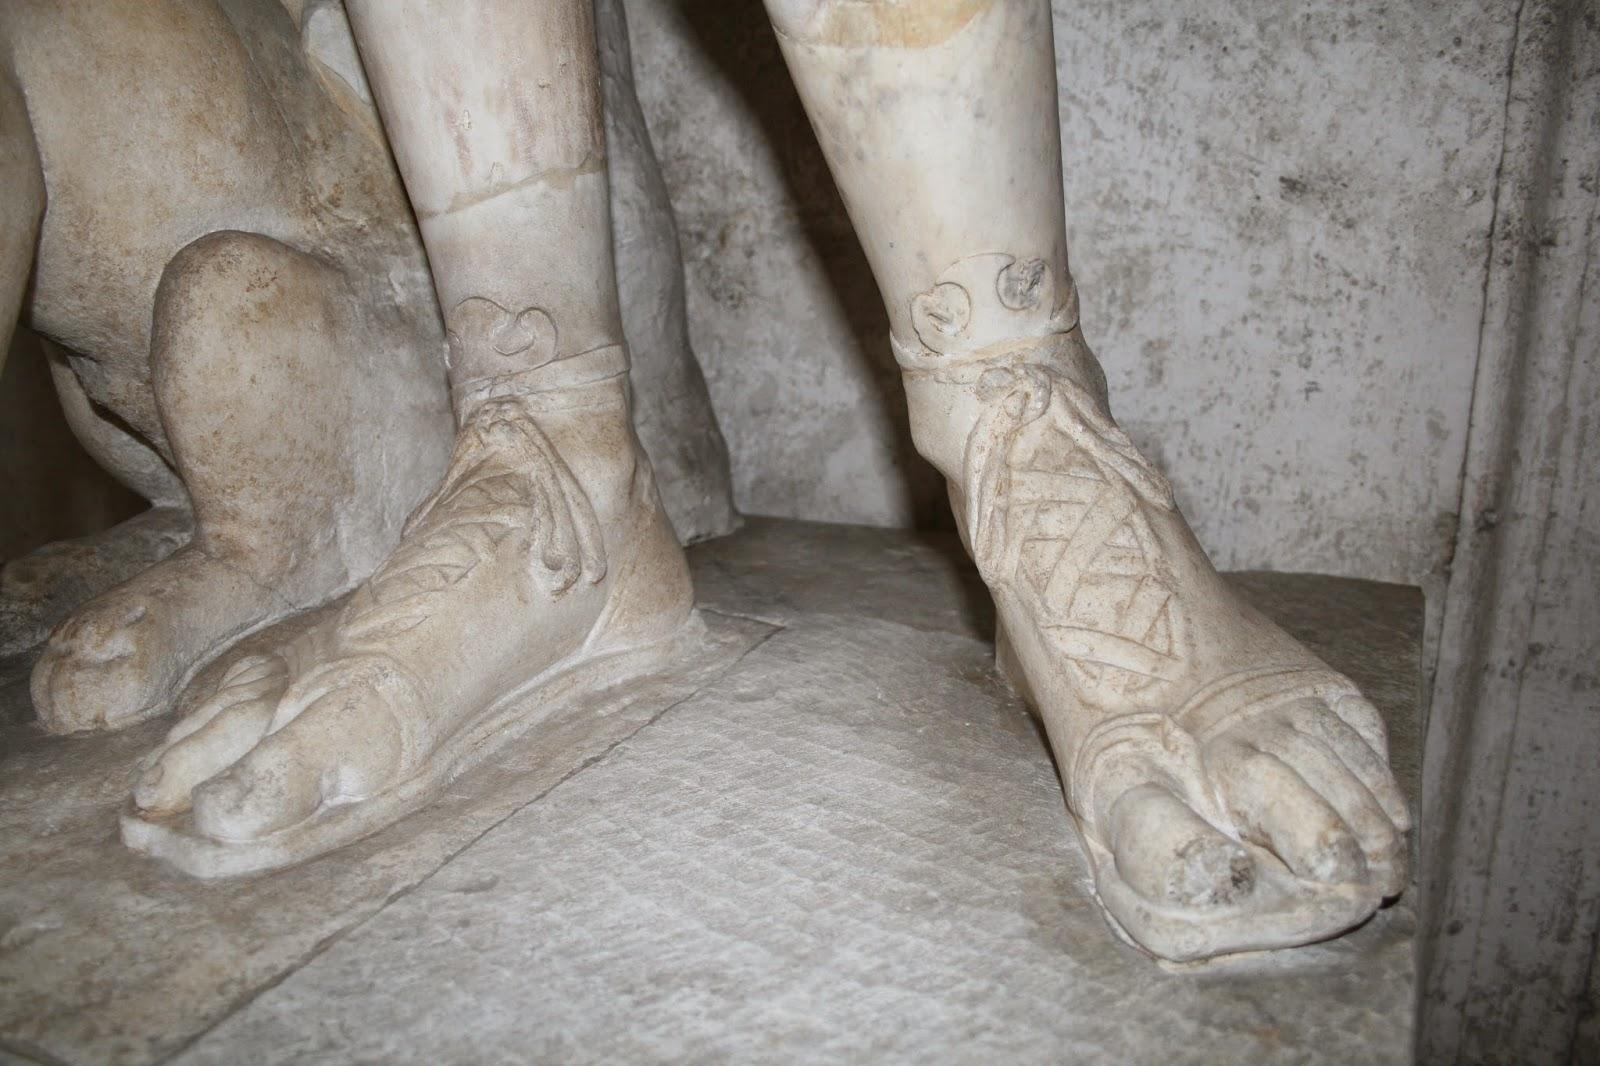 66a0b33a Calzado romano, Museos Capitolinos